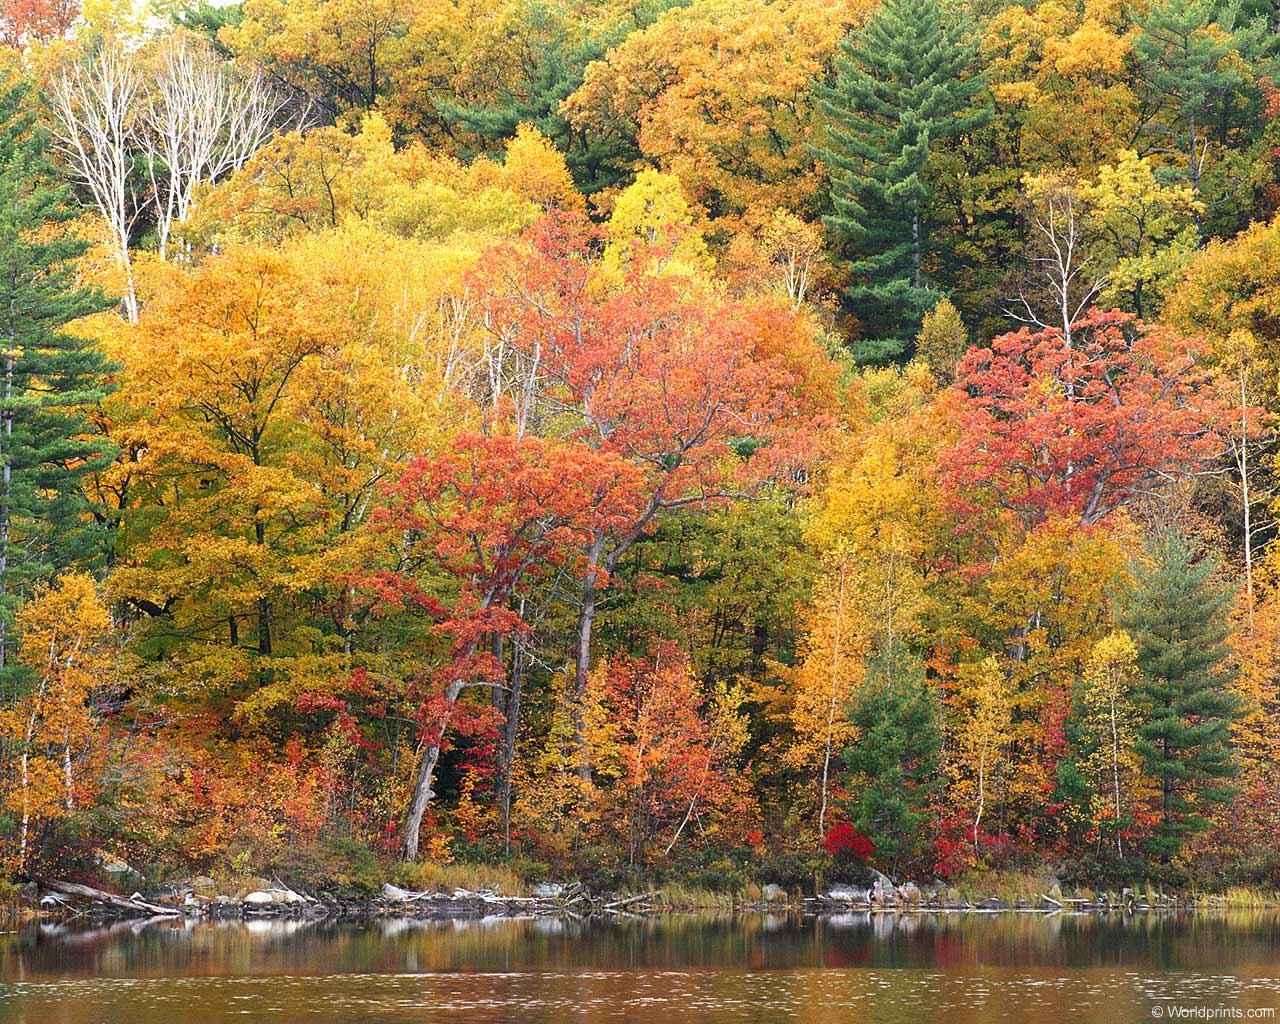 Fall Colors Wallpaper New England Fall Foliage Wallpapers For Desktop Wallpaper Cave